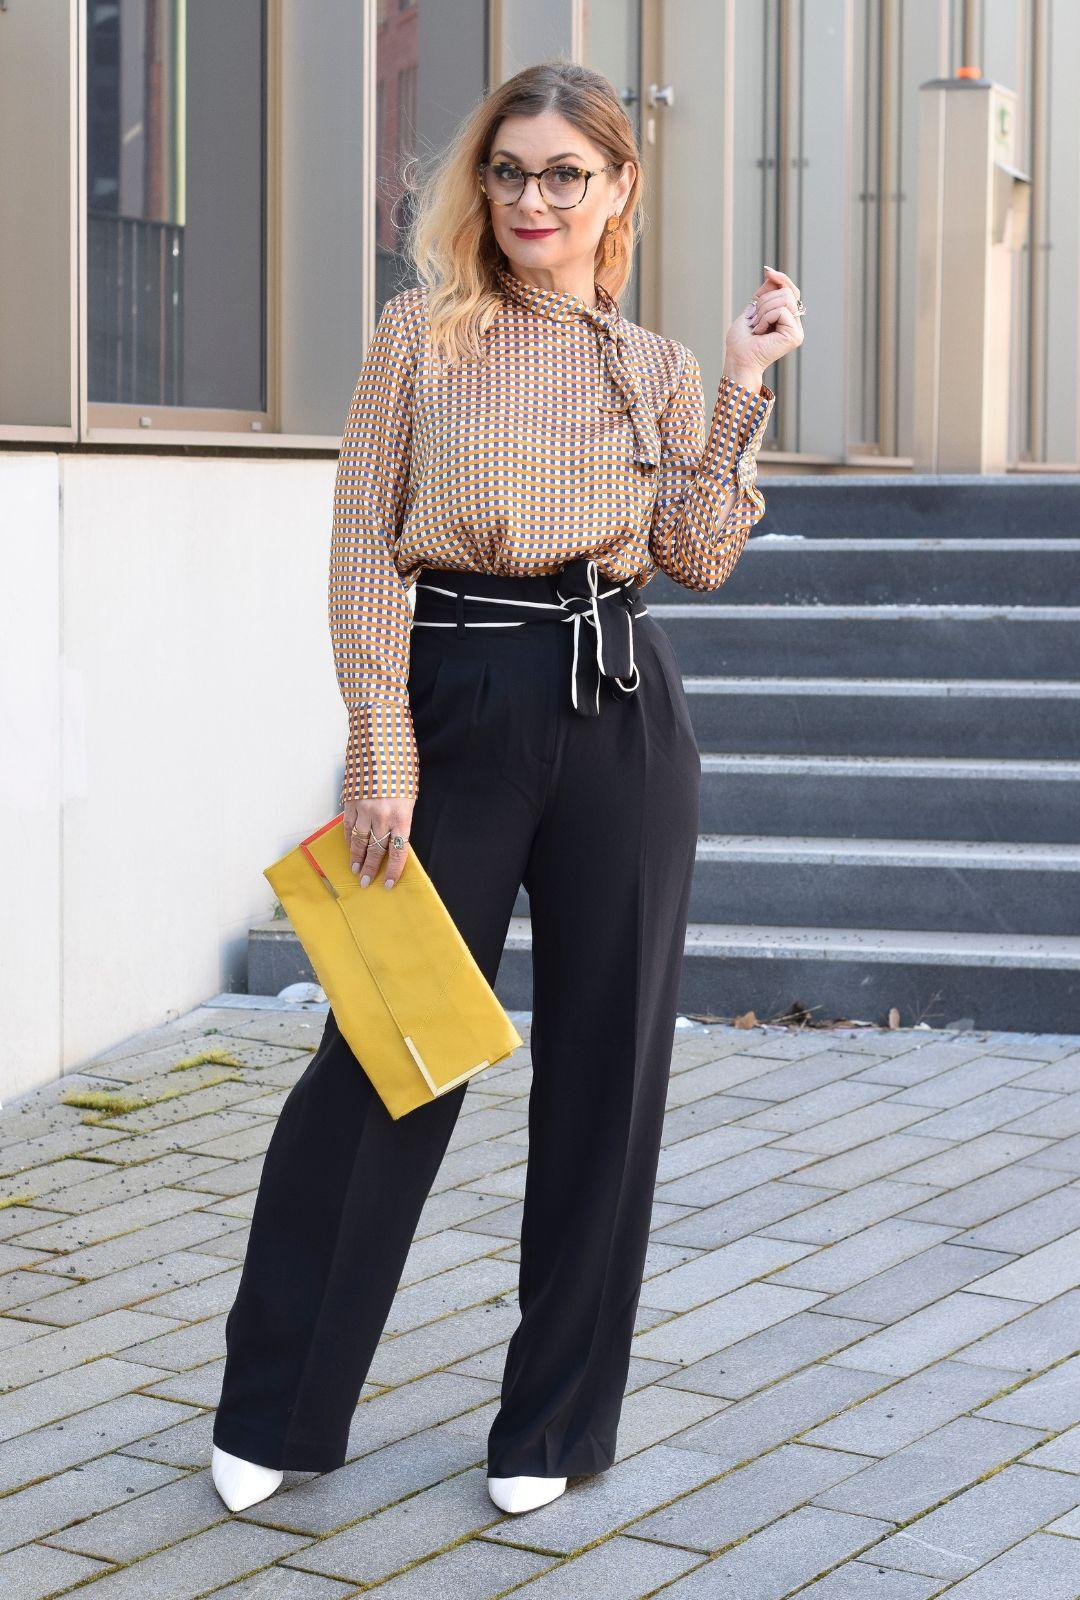 Business Outfit welche Muster kann ich im Büro tragen?